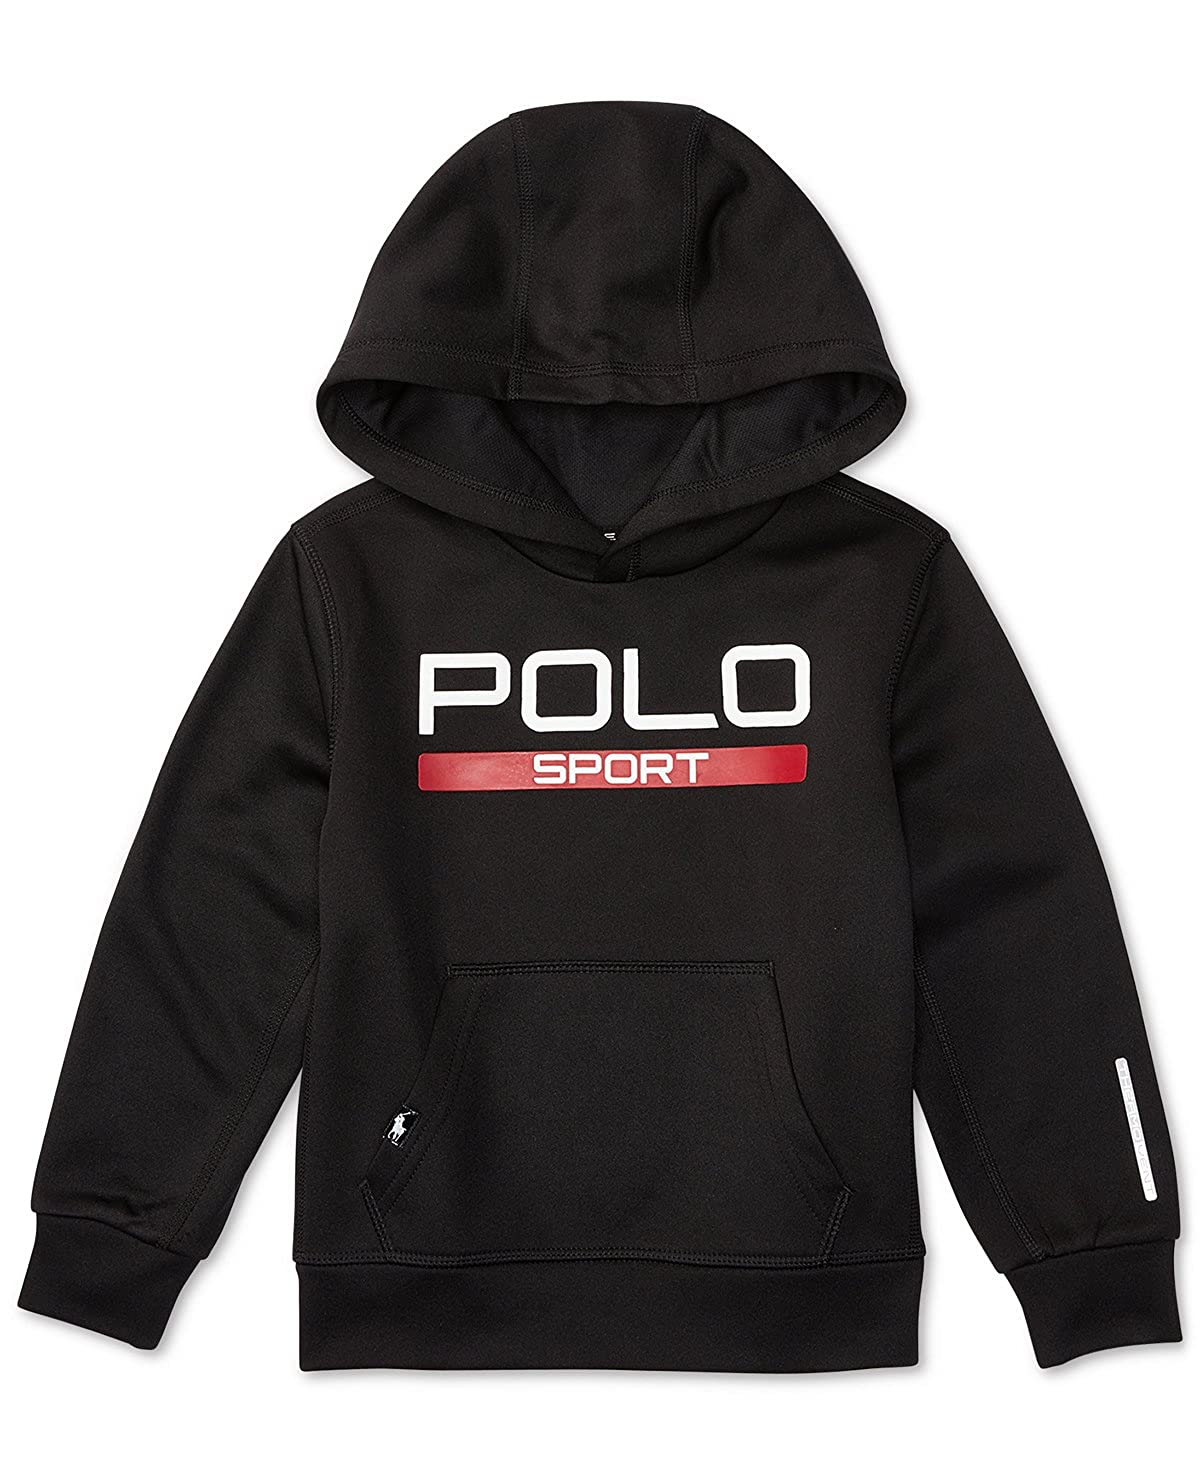 : Ralph Lauren Boys Polo Sport Fleece Hoodie: Clothing